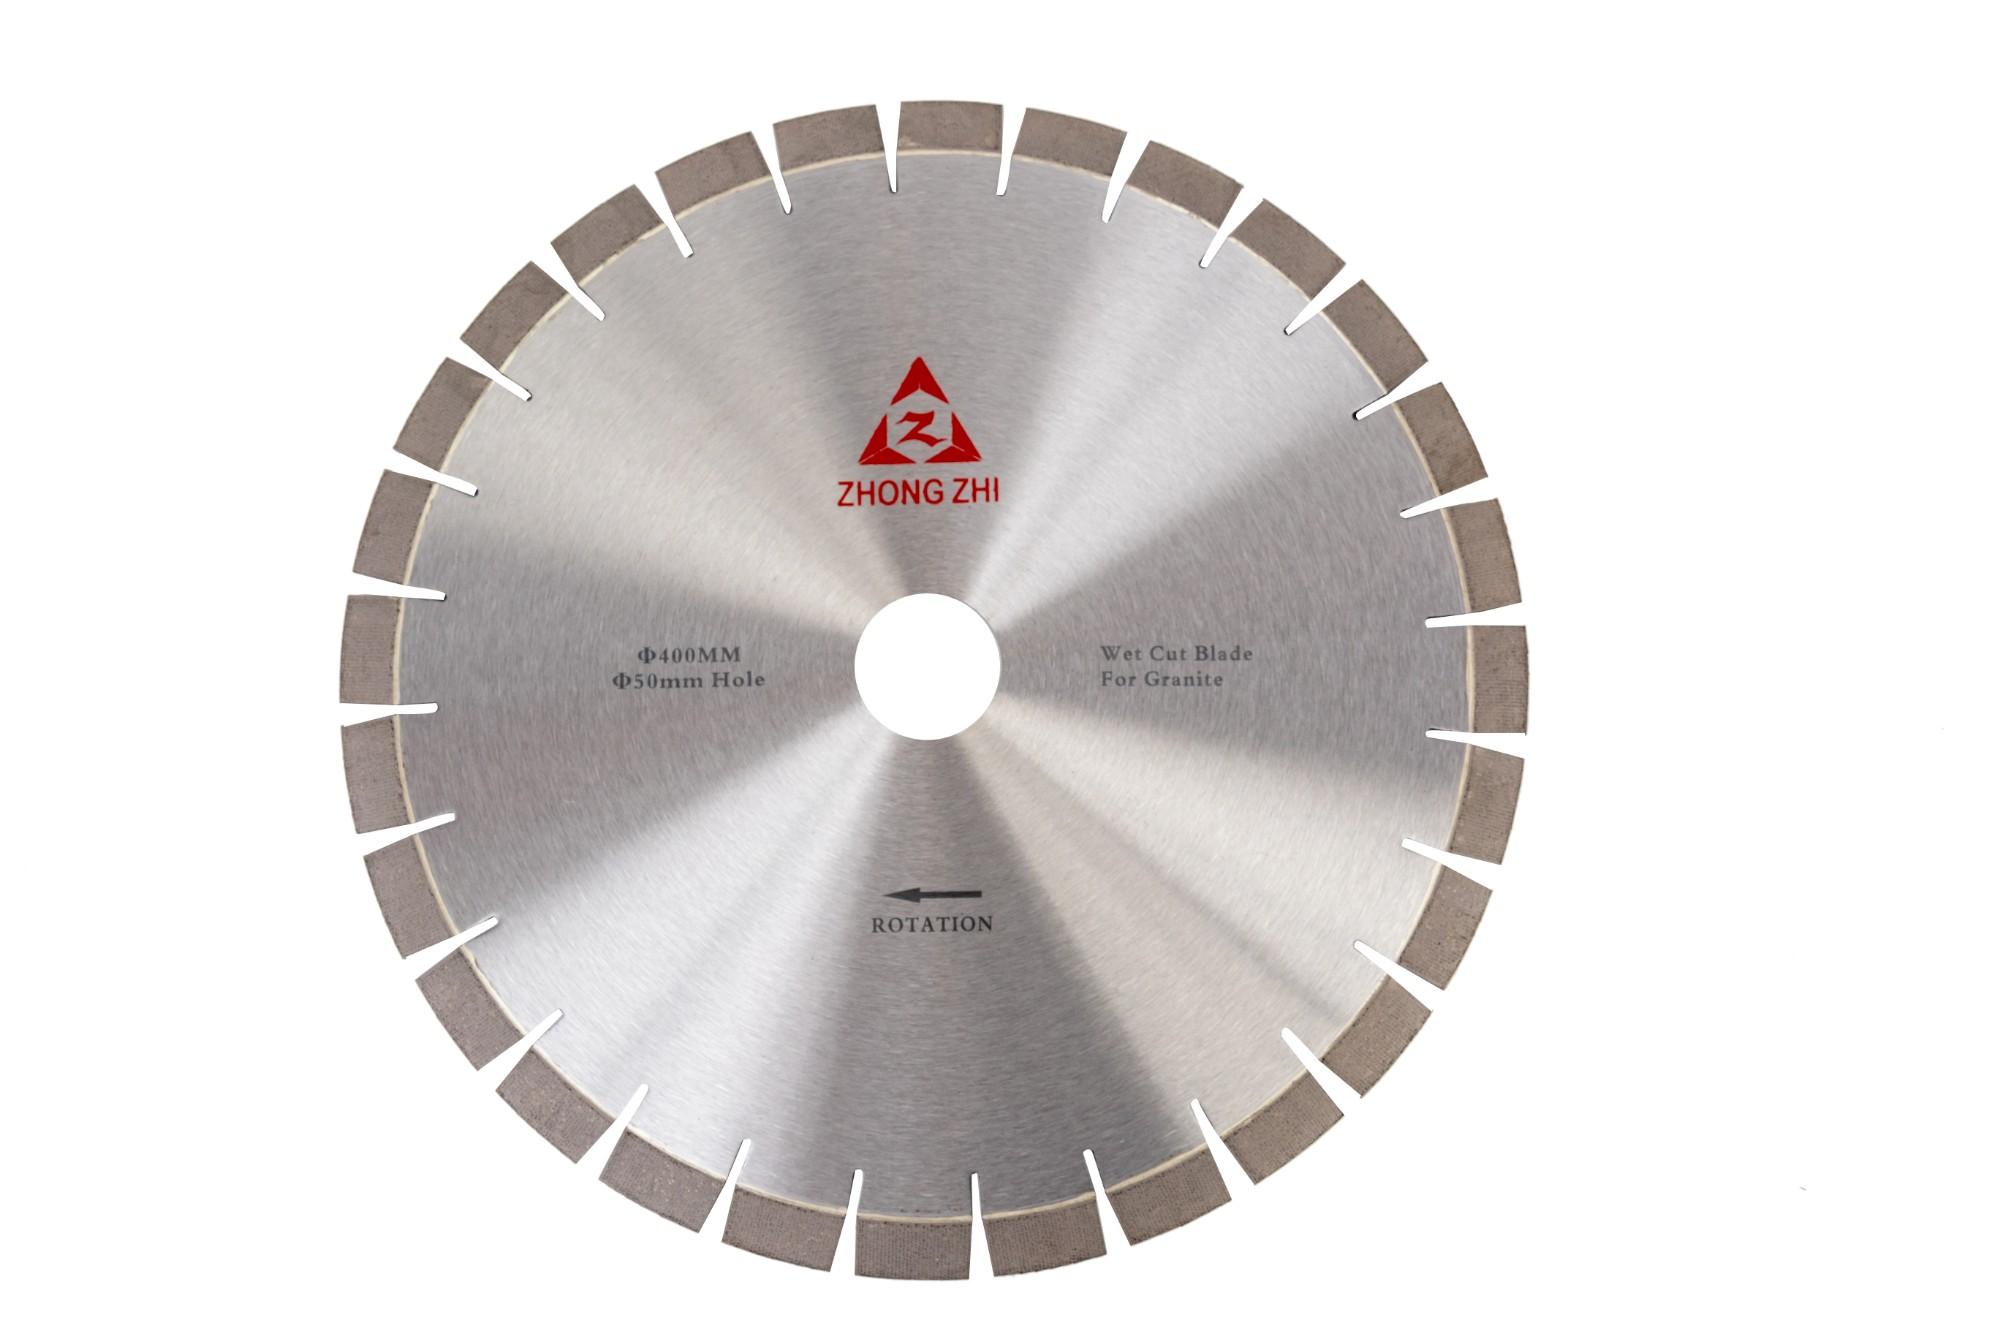 Arix Diamond Blade for Granite Cutting